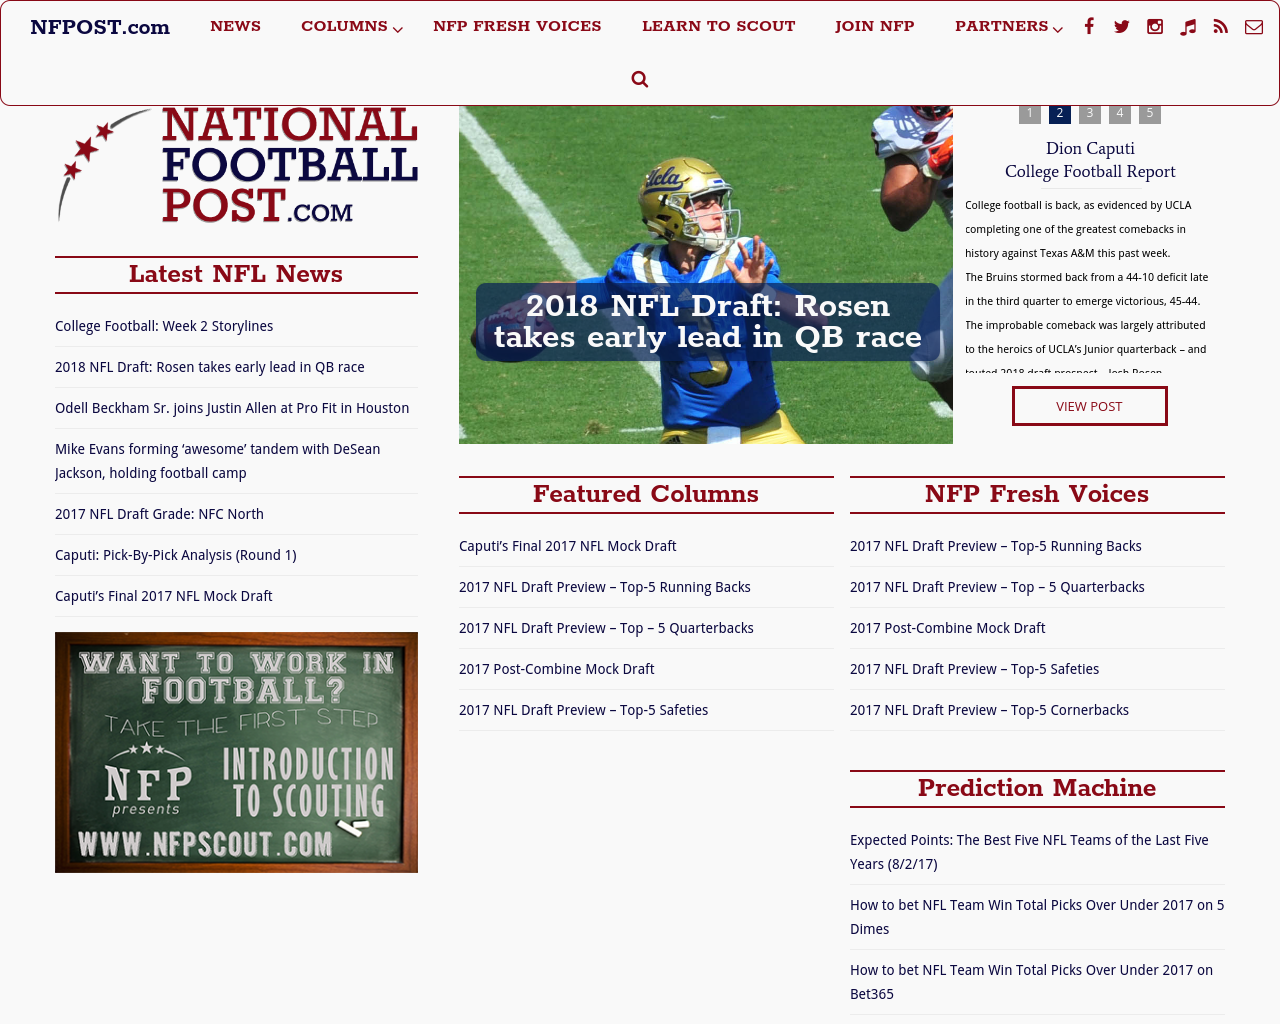 National-Football-Post-Advertising-Reviews-Pricing